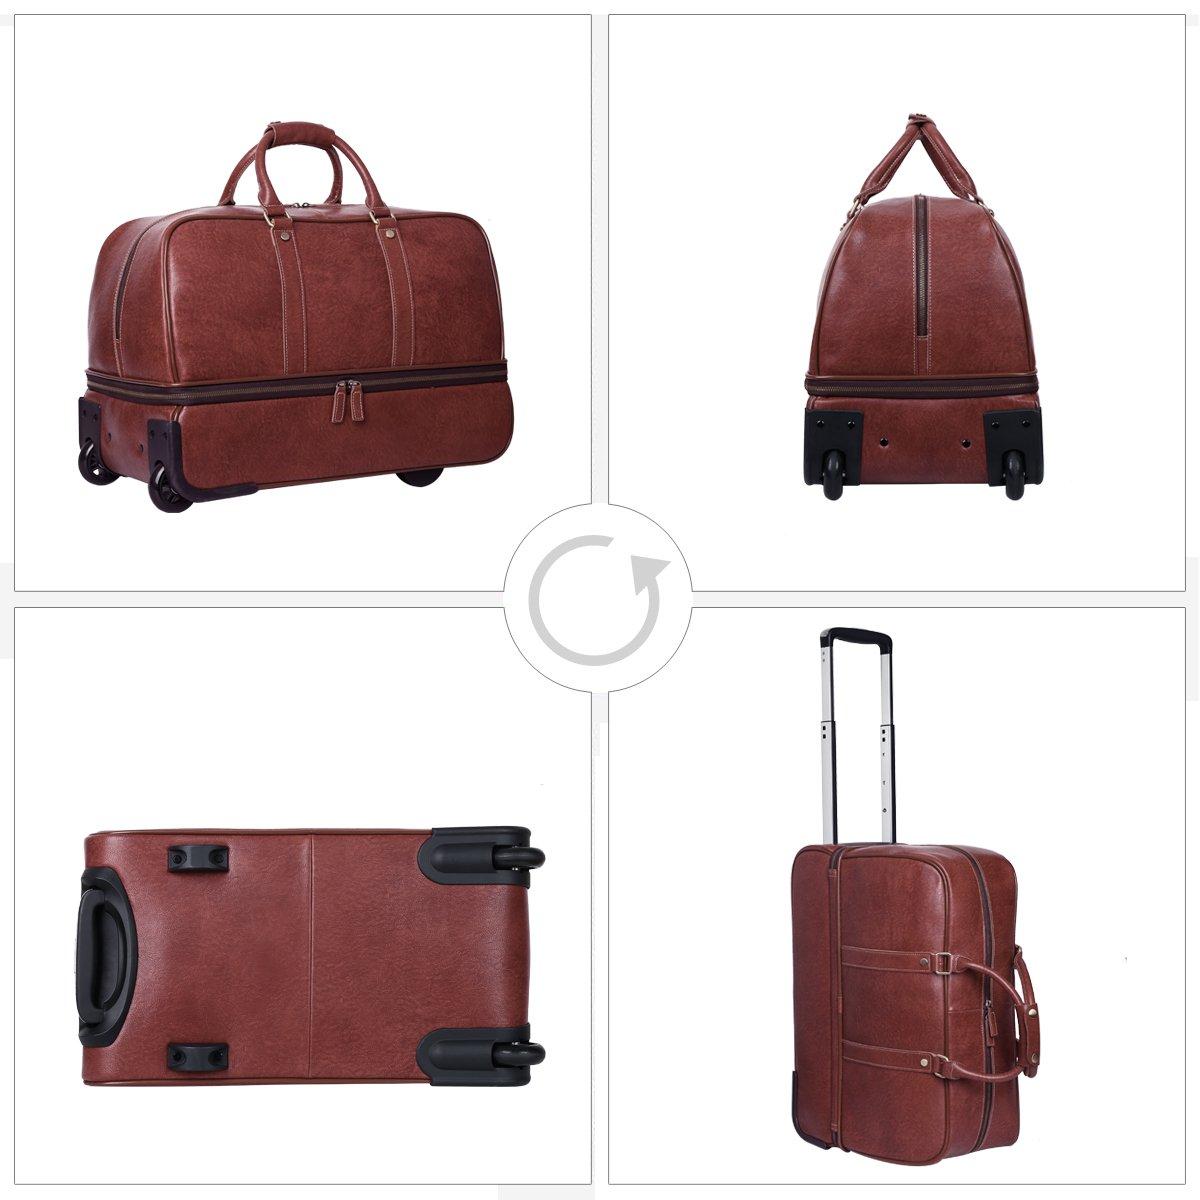 Leathario Leather Luggage travel duffle bag weekend overnight bag (Burgendy) by Leathario (Image #3)